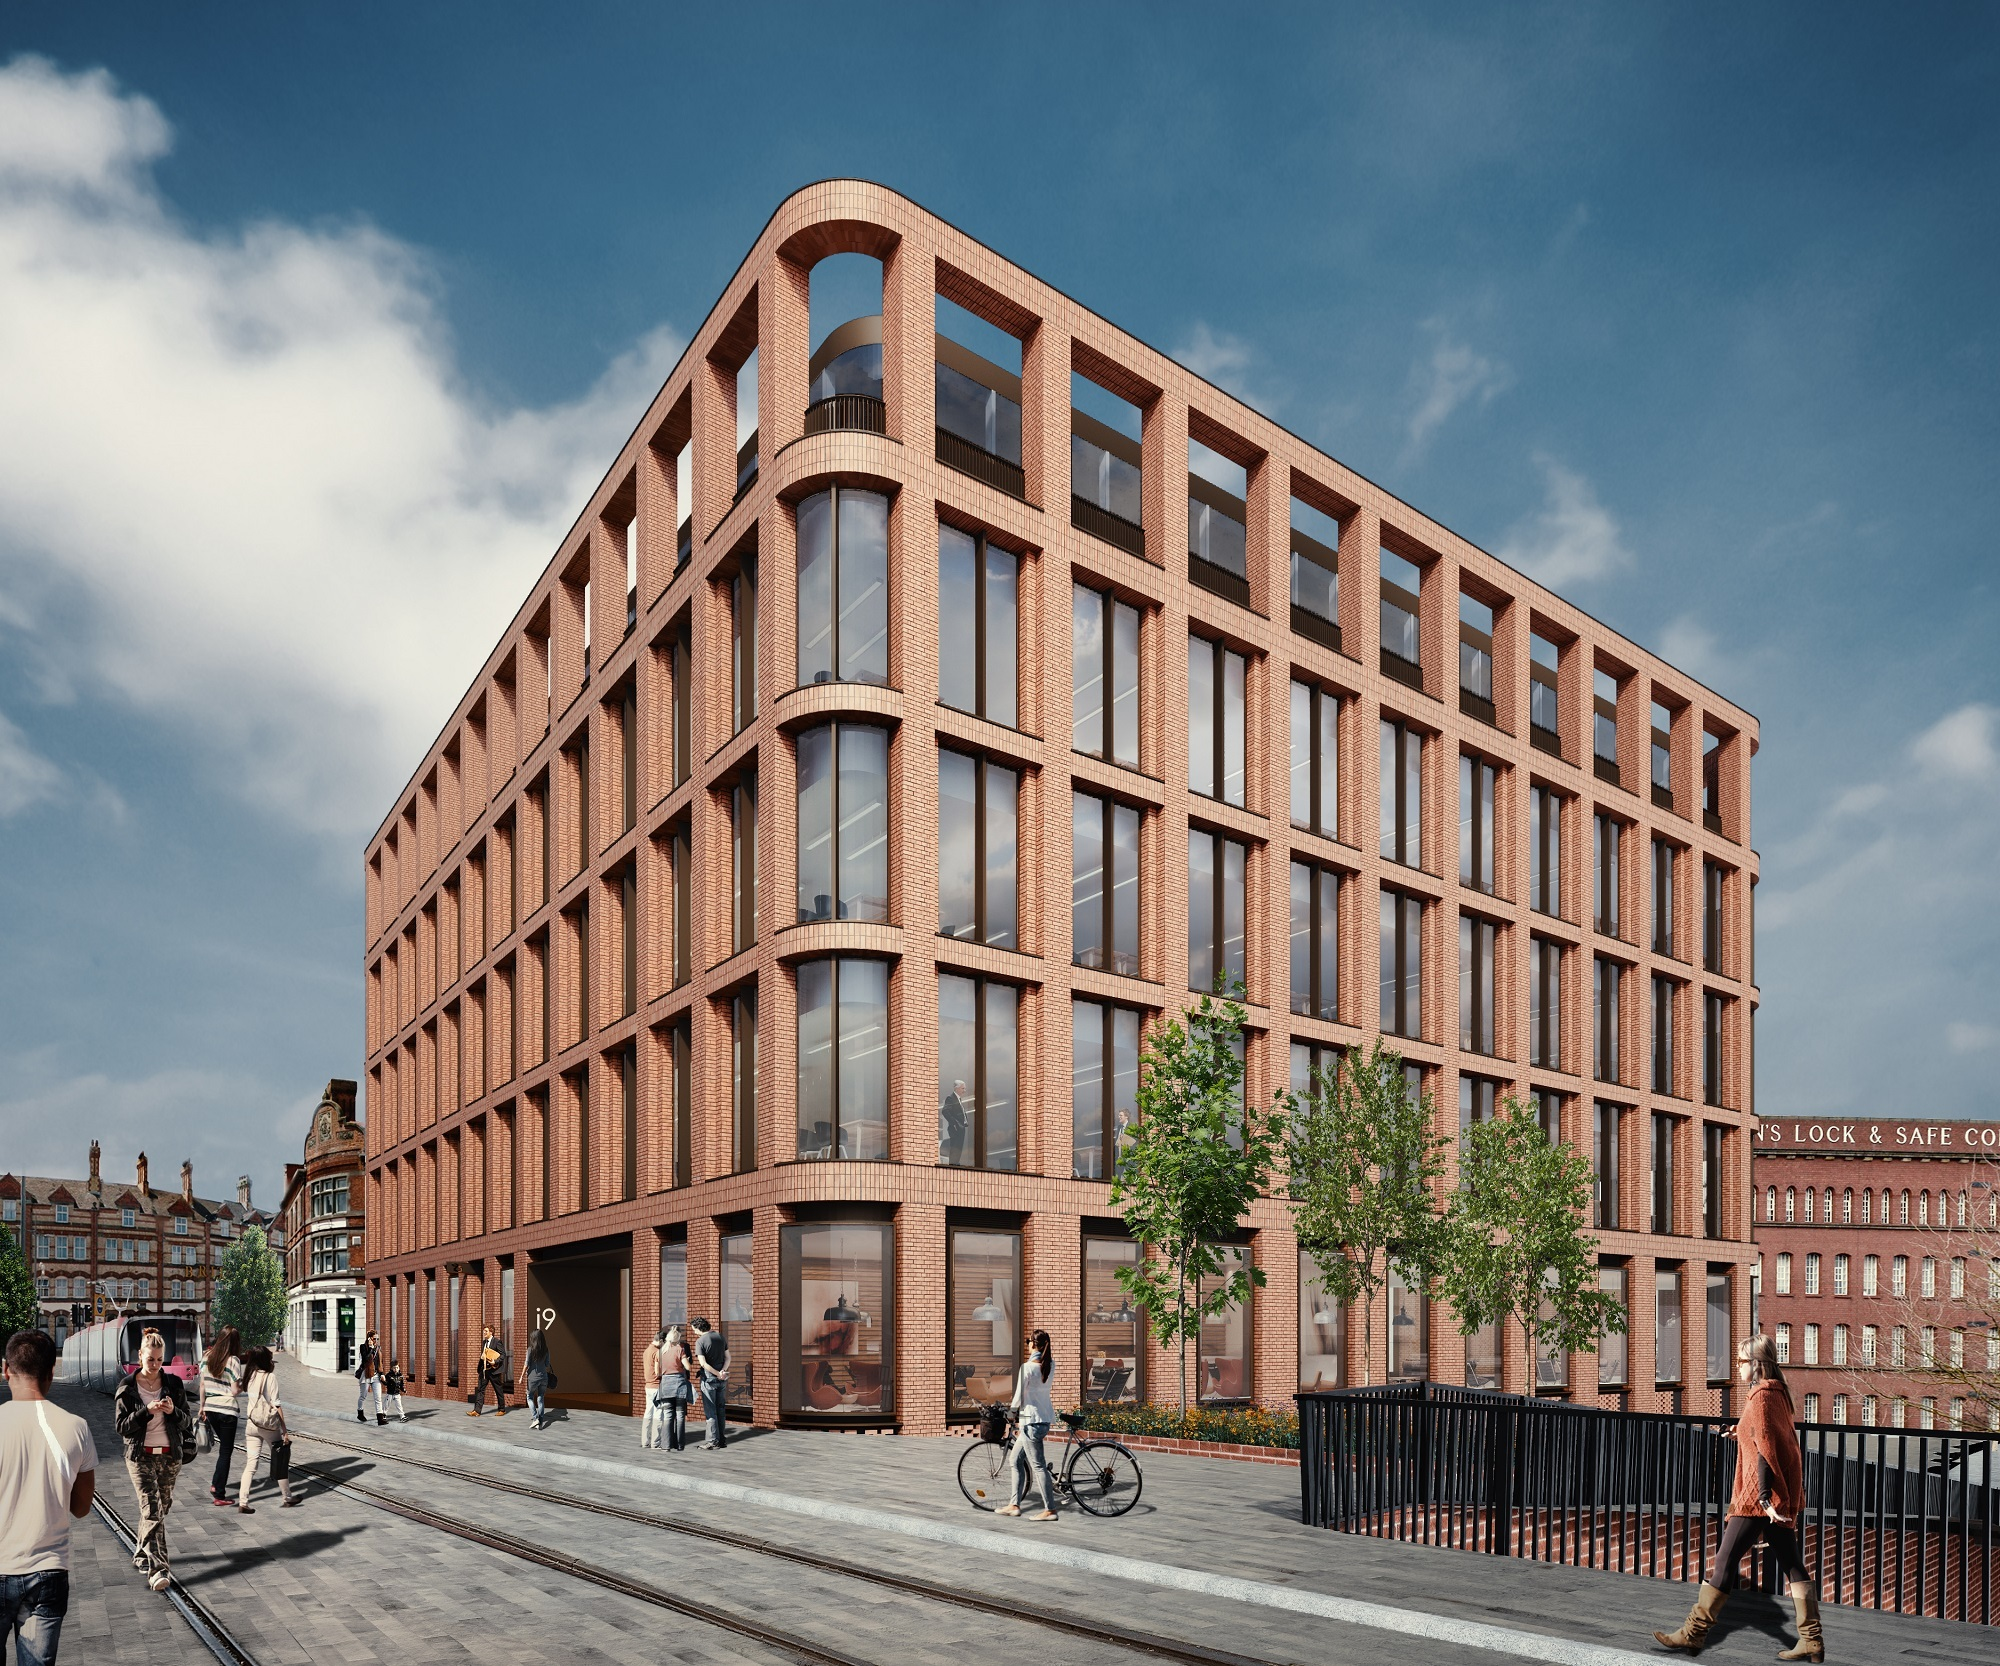 We're on cloud i9 for the Prime Wolverhampton development scheme image